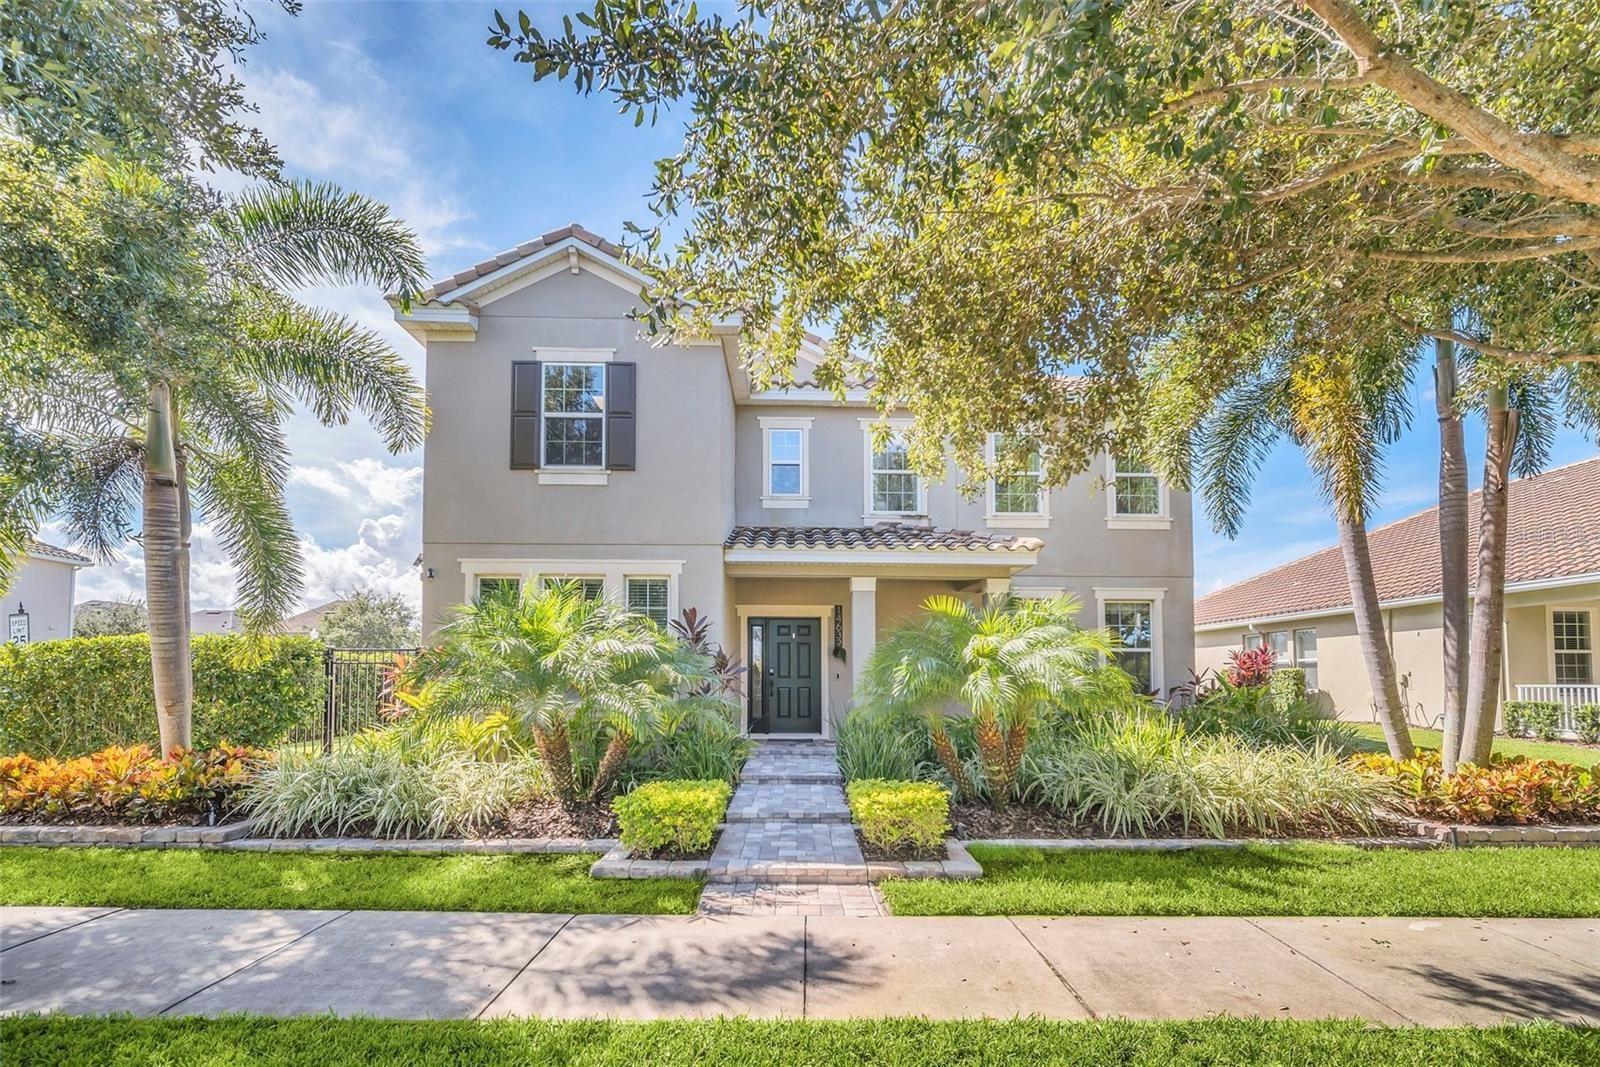 14632 PORTER ROAD, Winter Garden, FL 34787 - #: O5974968